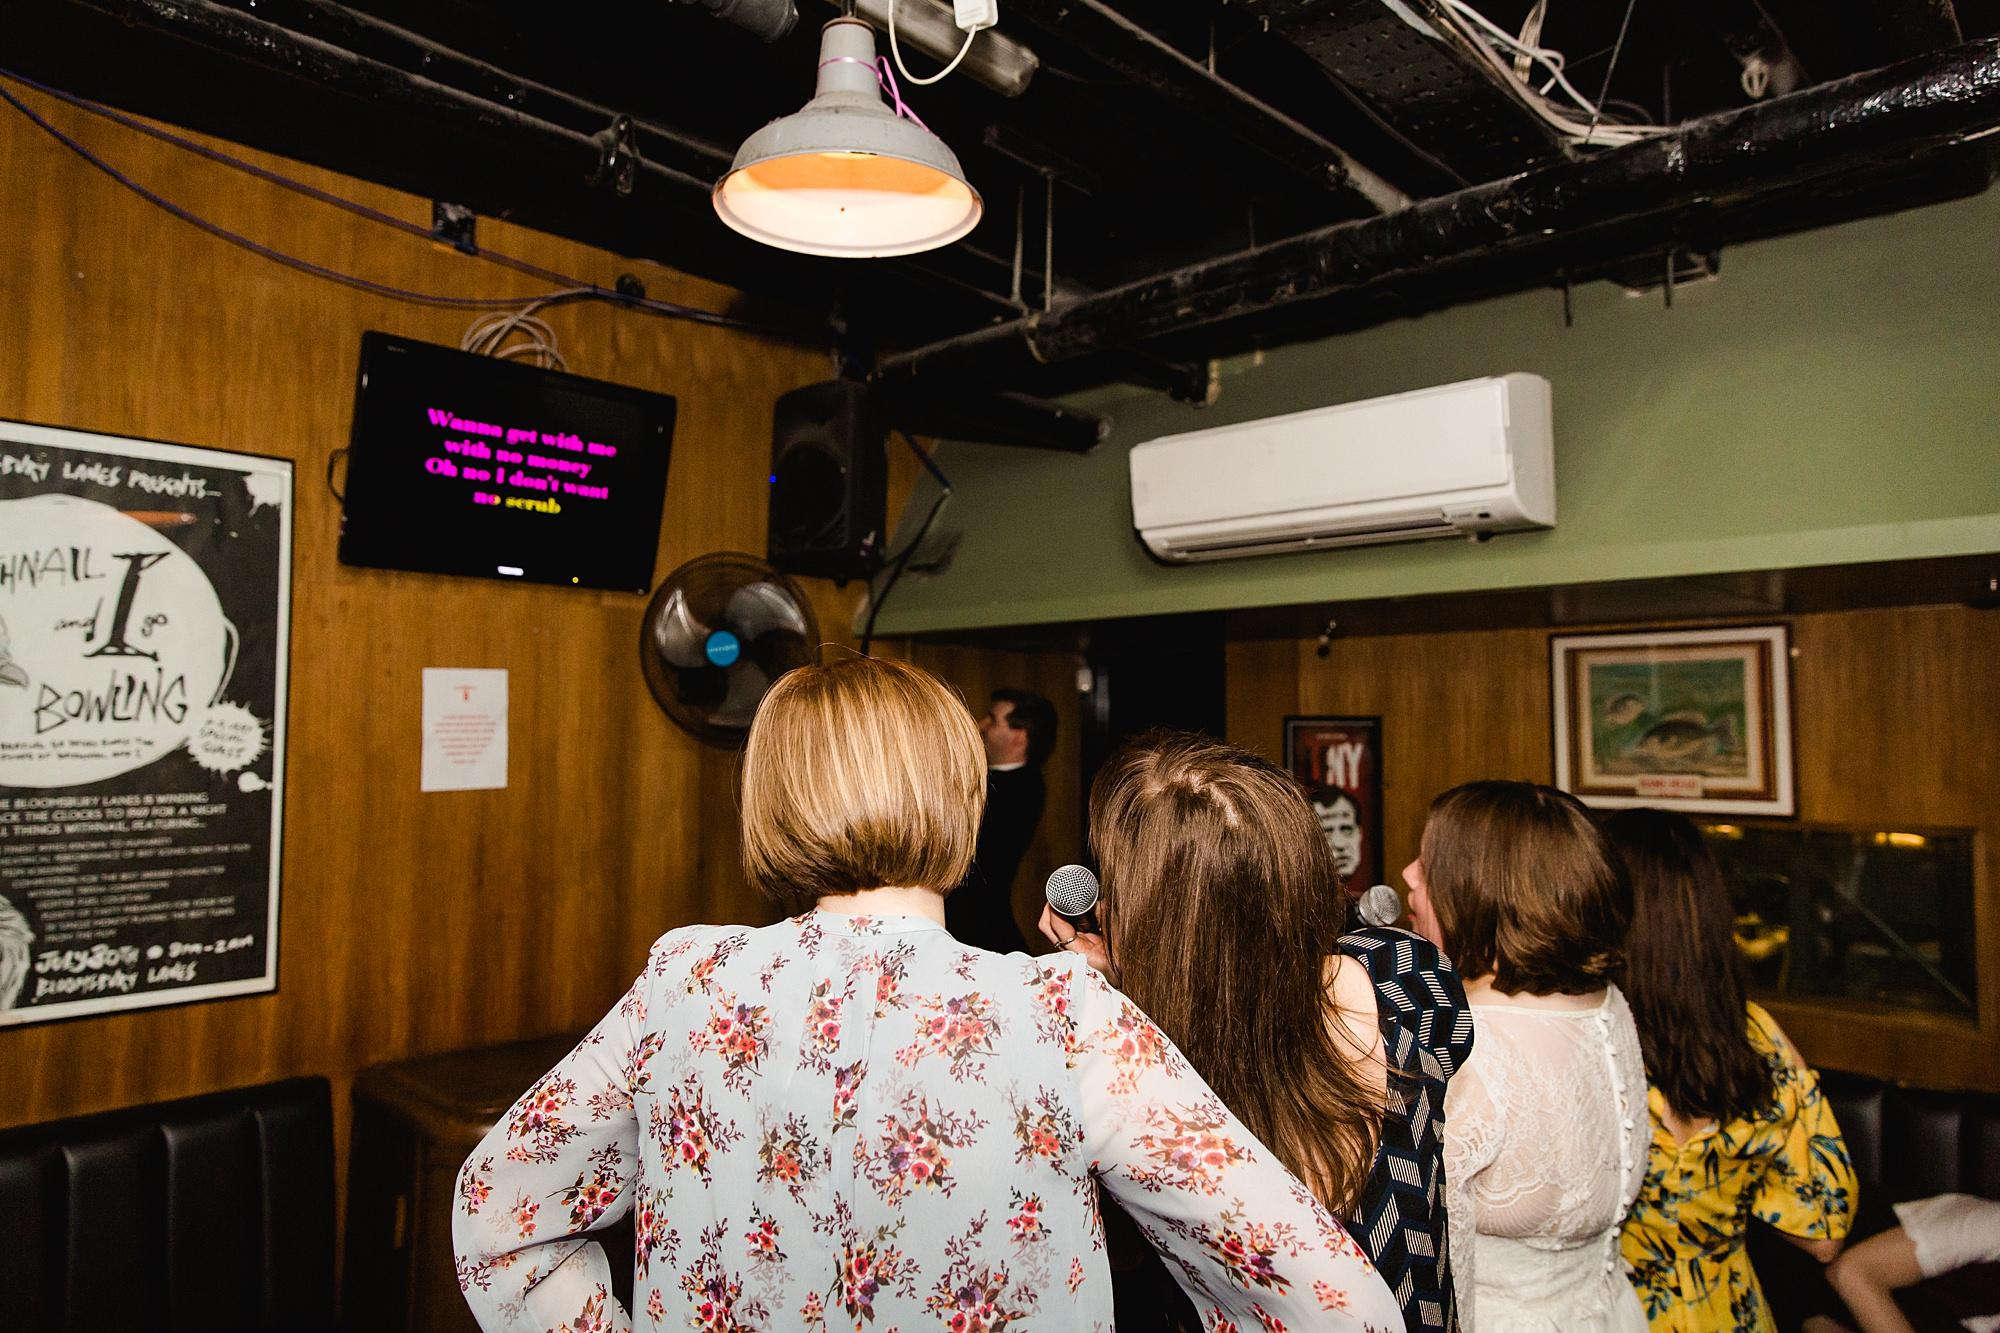 fun london wedding bowling guests enjoy karaoke